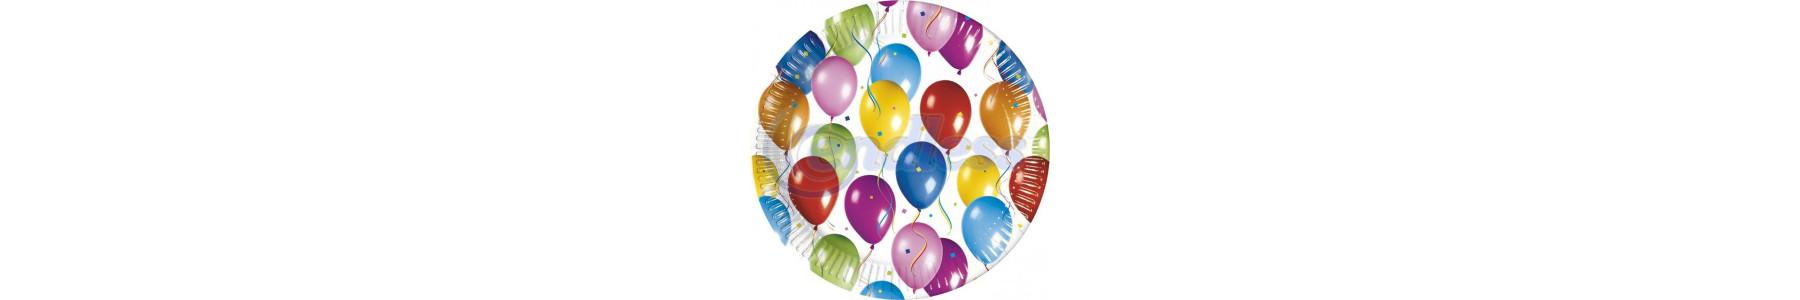 Accesorii de petrecere Balloons Fiesta